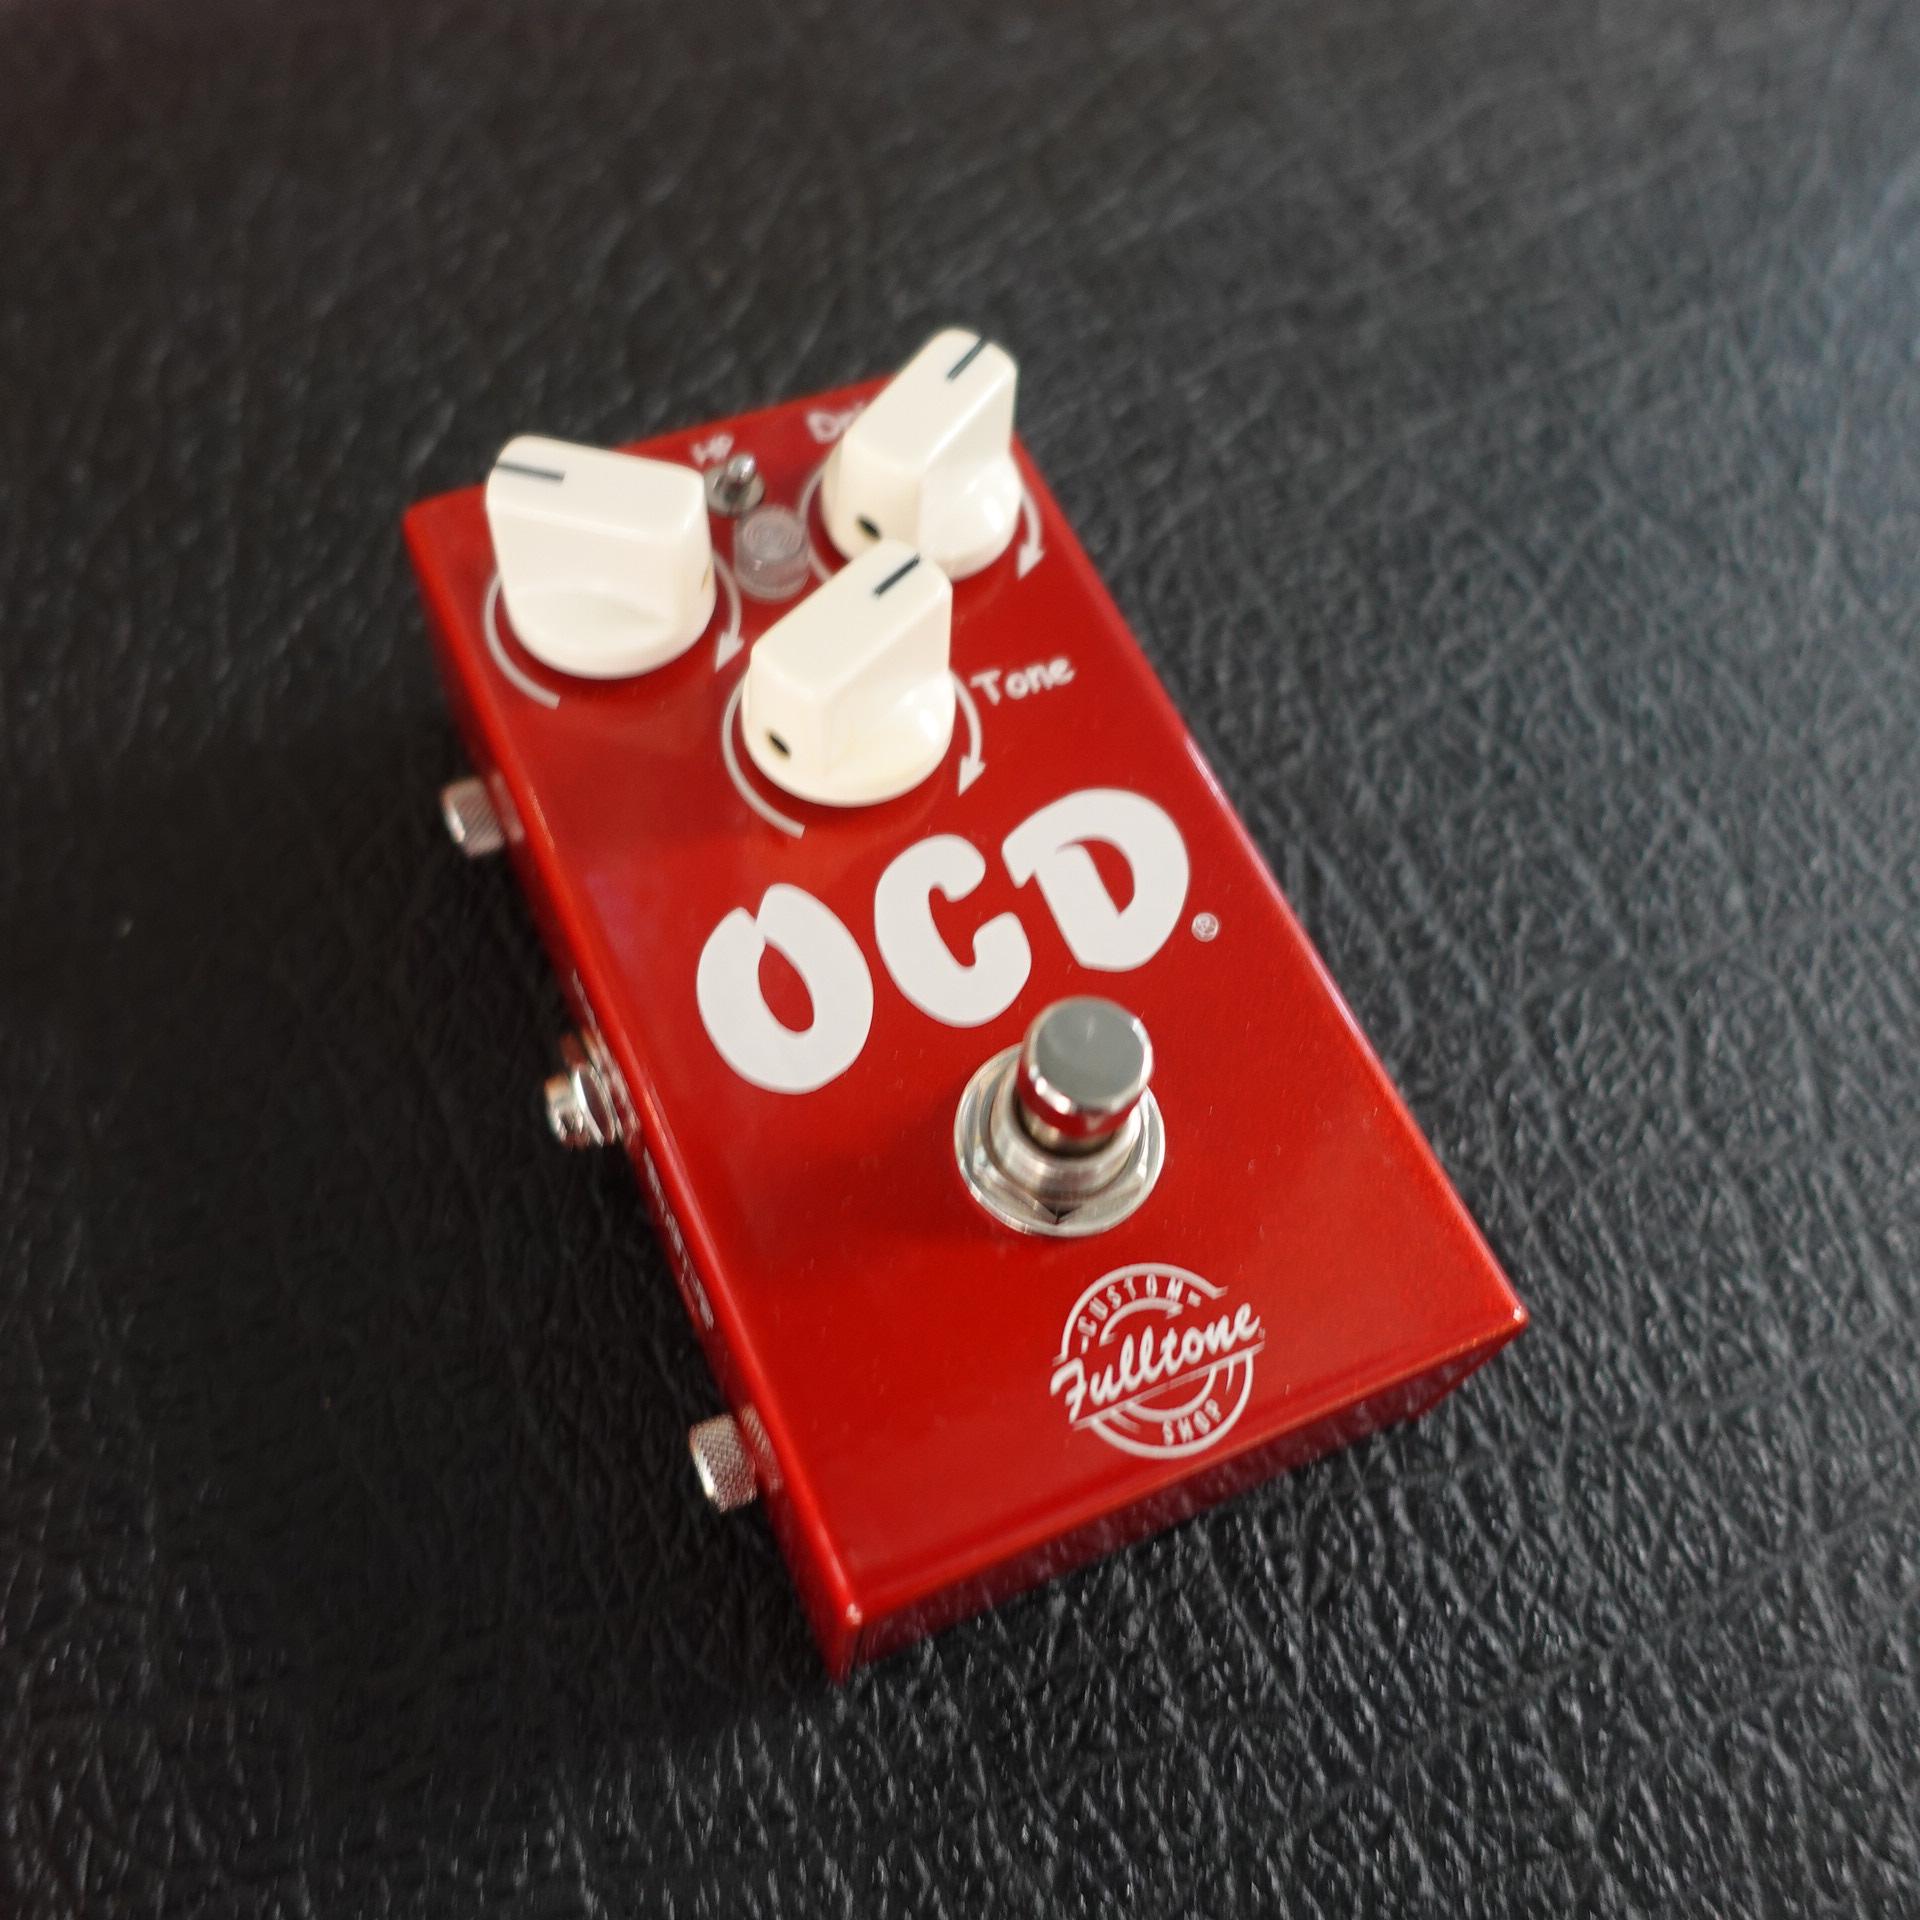 Fulltone OCD RED limited edition